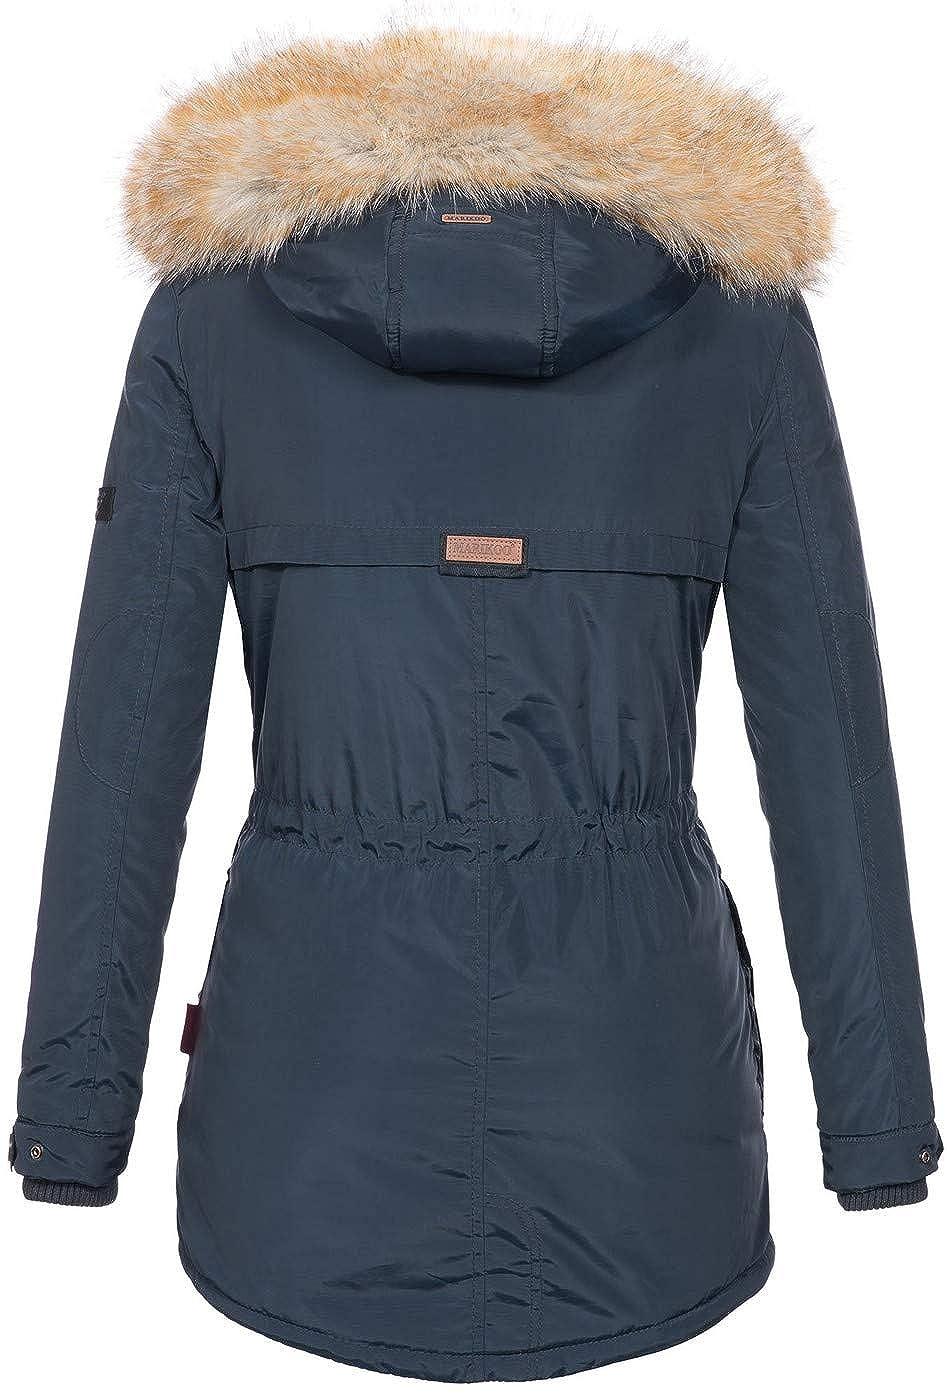 69aefb662ff3 Marikoo Damen Winterjacke Kapuze Kunstfell Winter Jacke warm lang ...